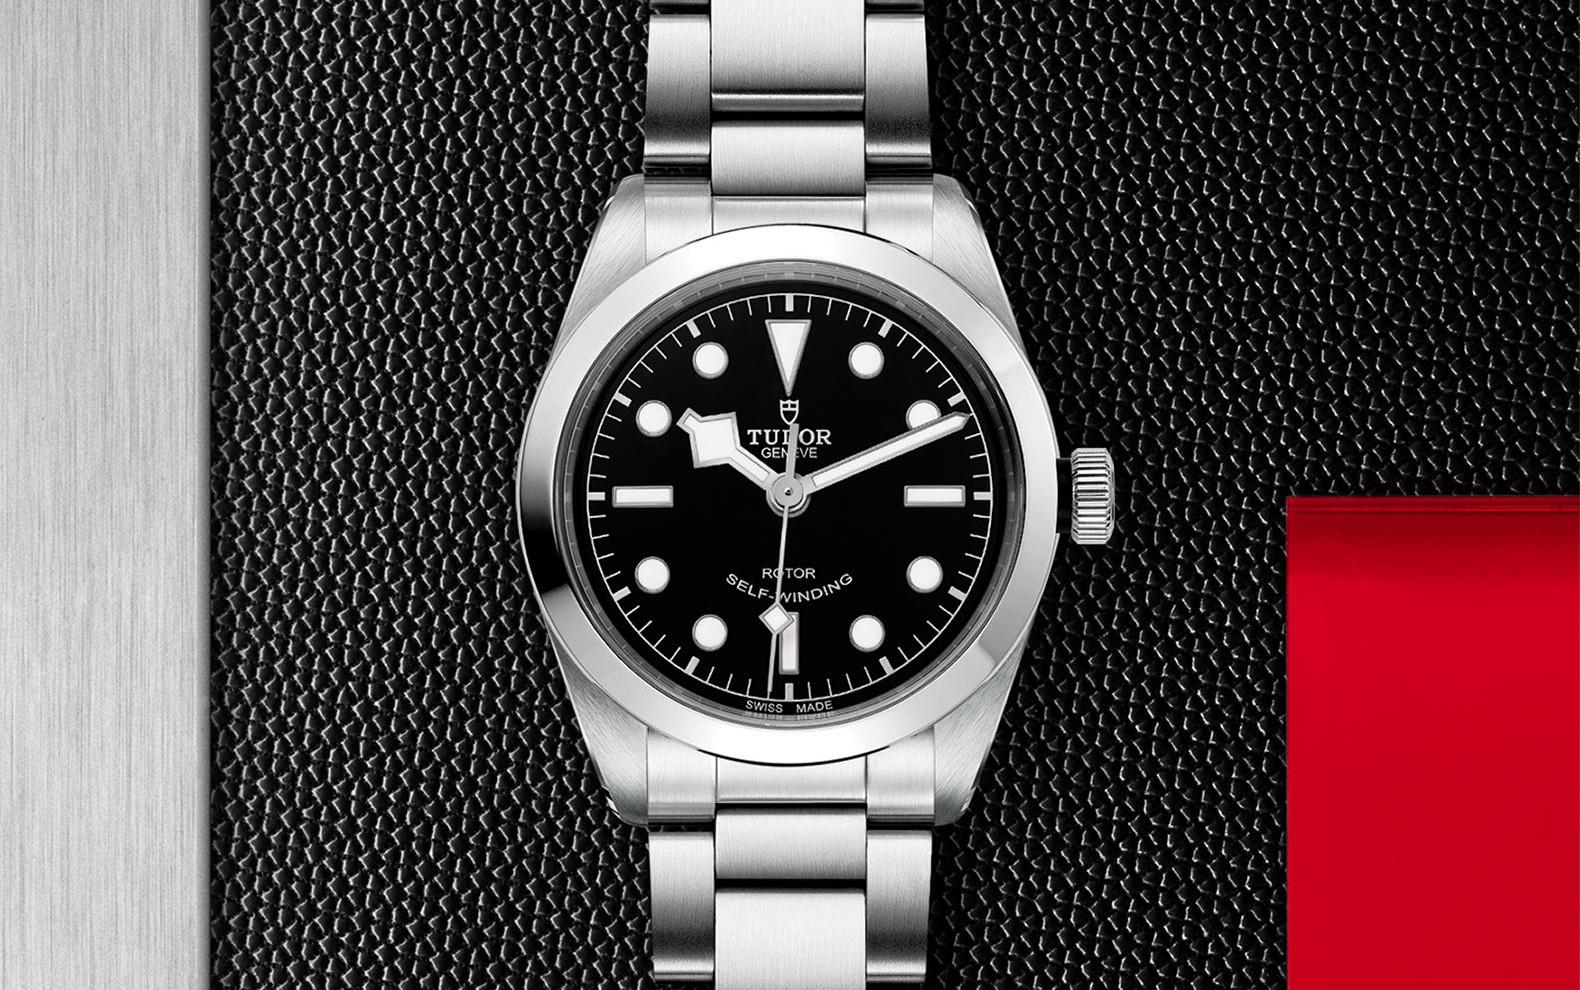 TUDOR_BLACK BAY 36 M79500-0007